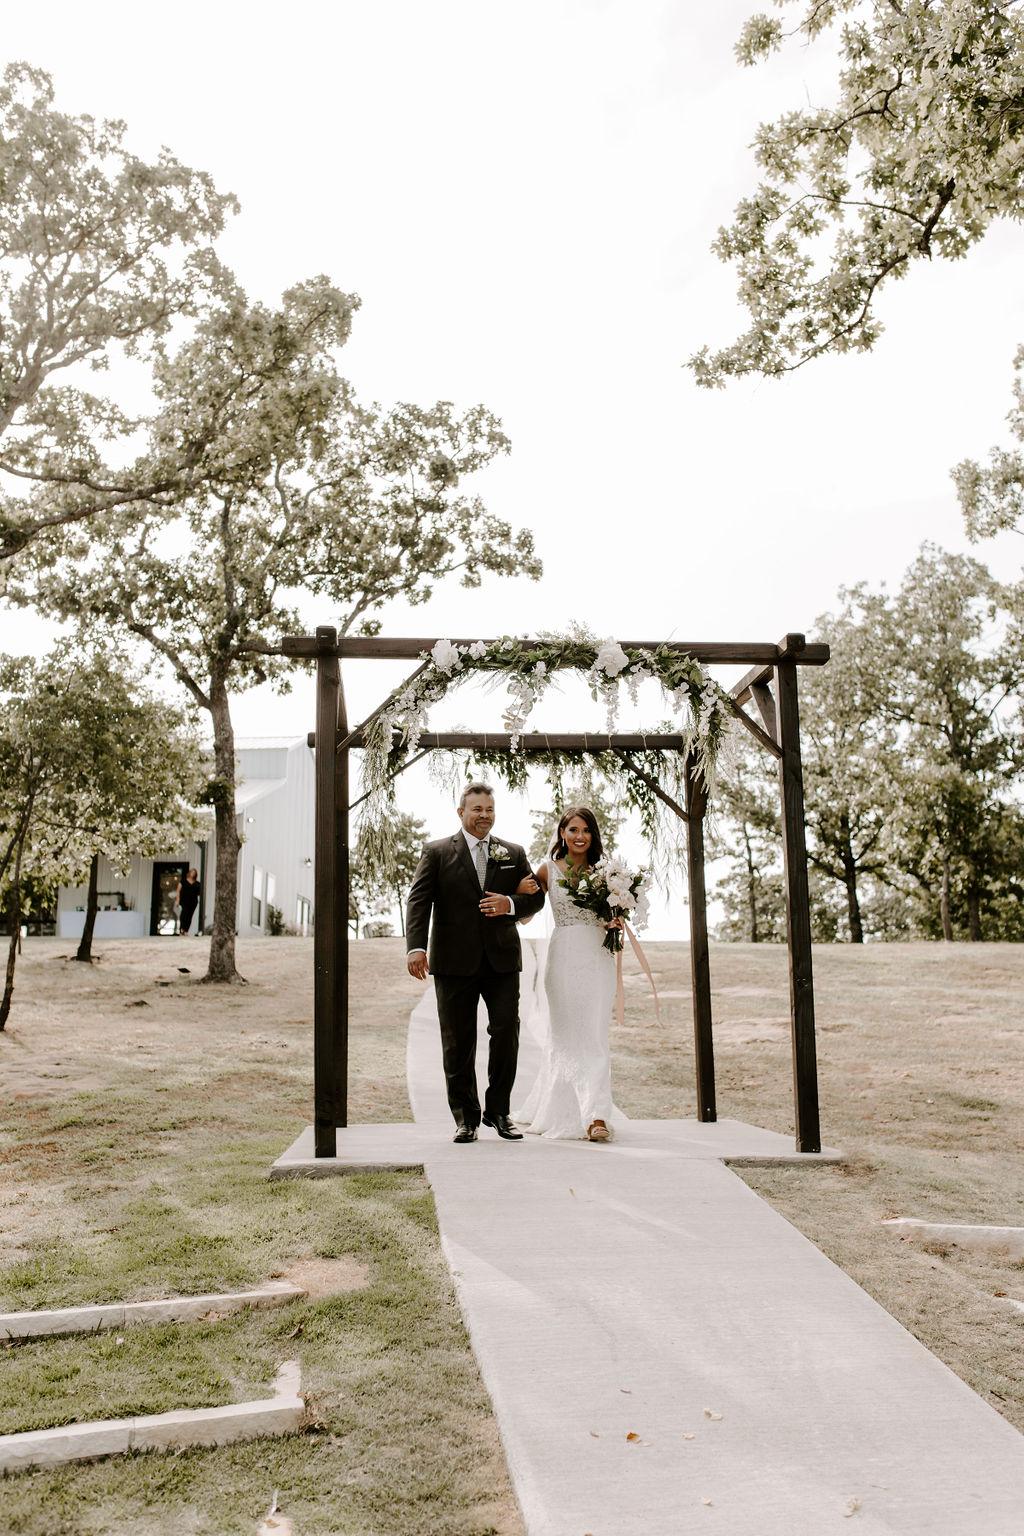 Tulsa White Barn Wedding Venue Outdoor Ceremony 69.jpg